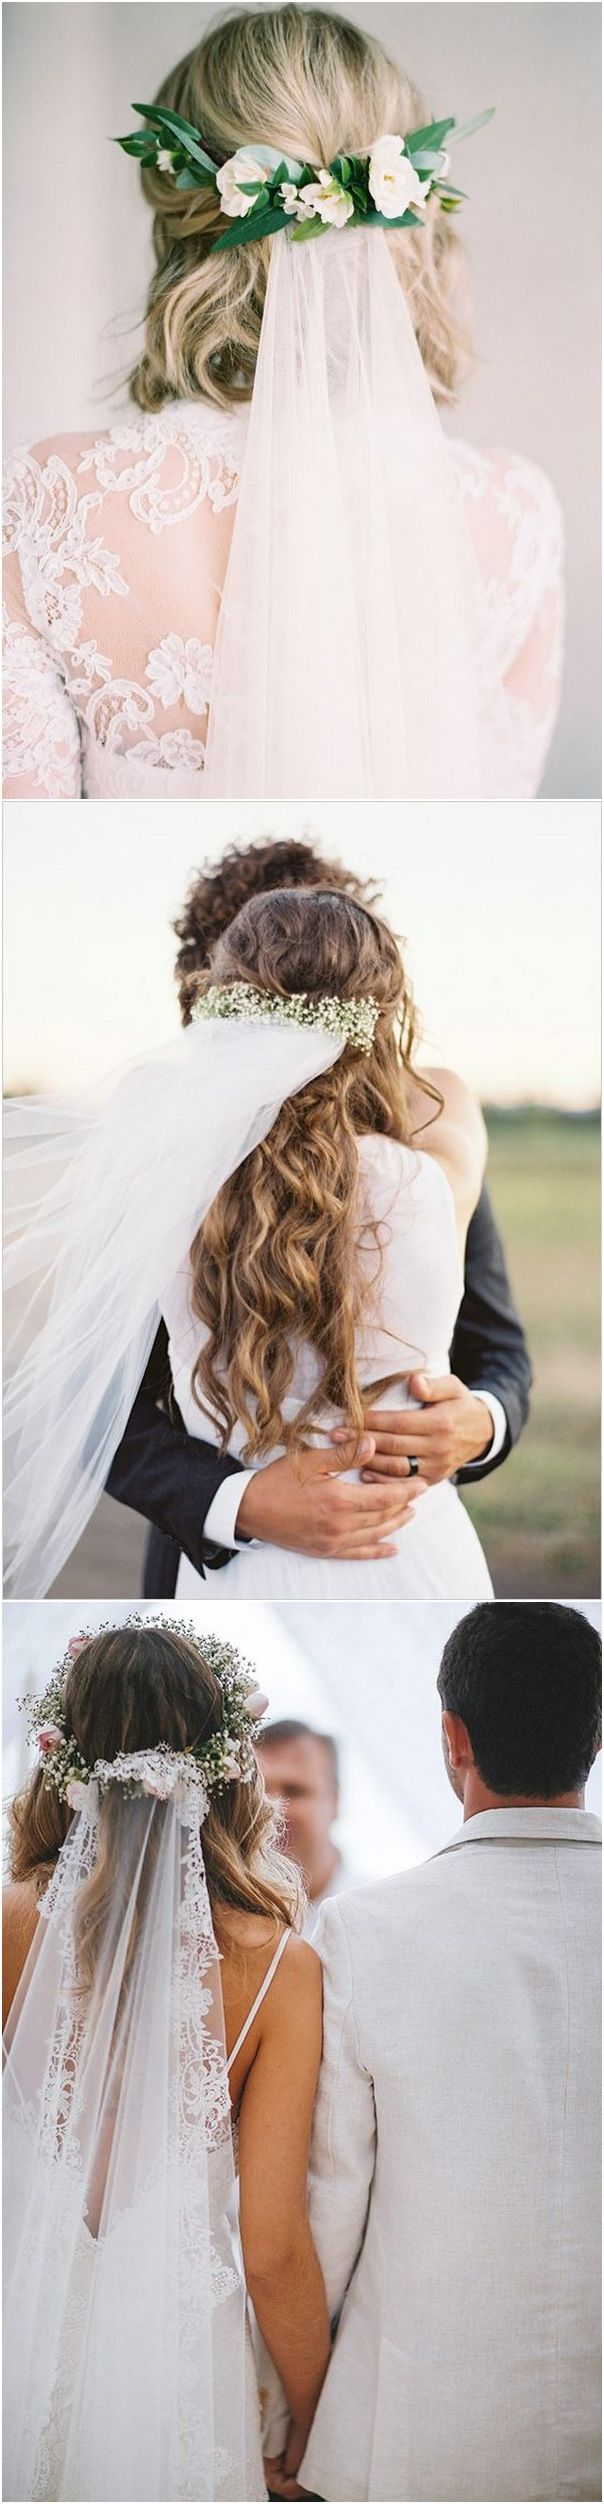 Wedding hairstyles with flower crown and veil #wedding #weddinghairstyles #bridalfashion